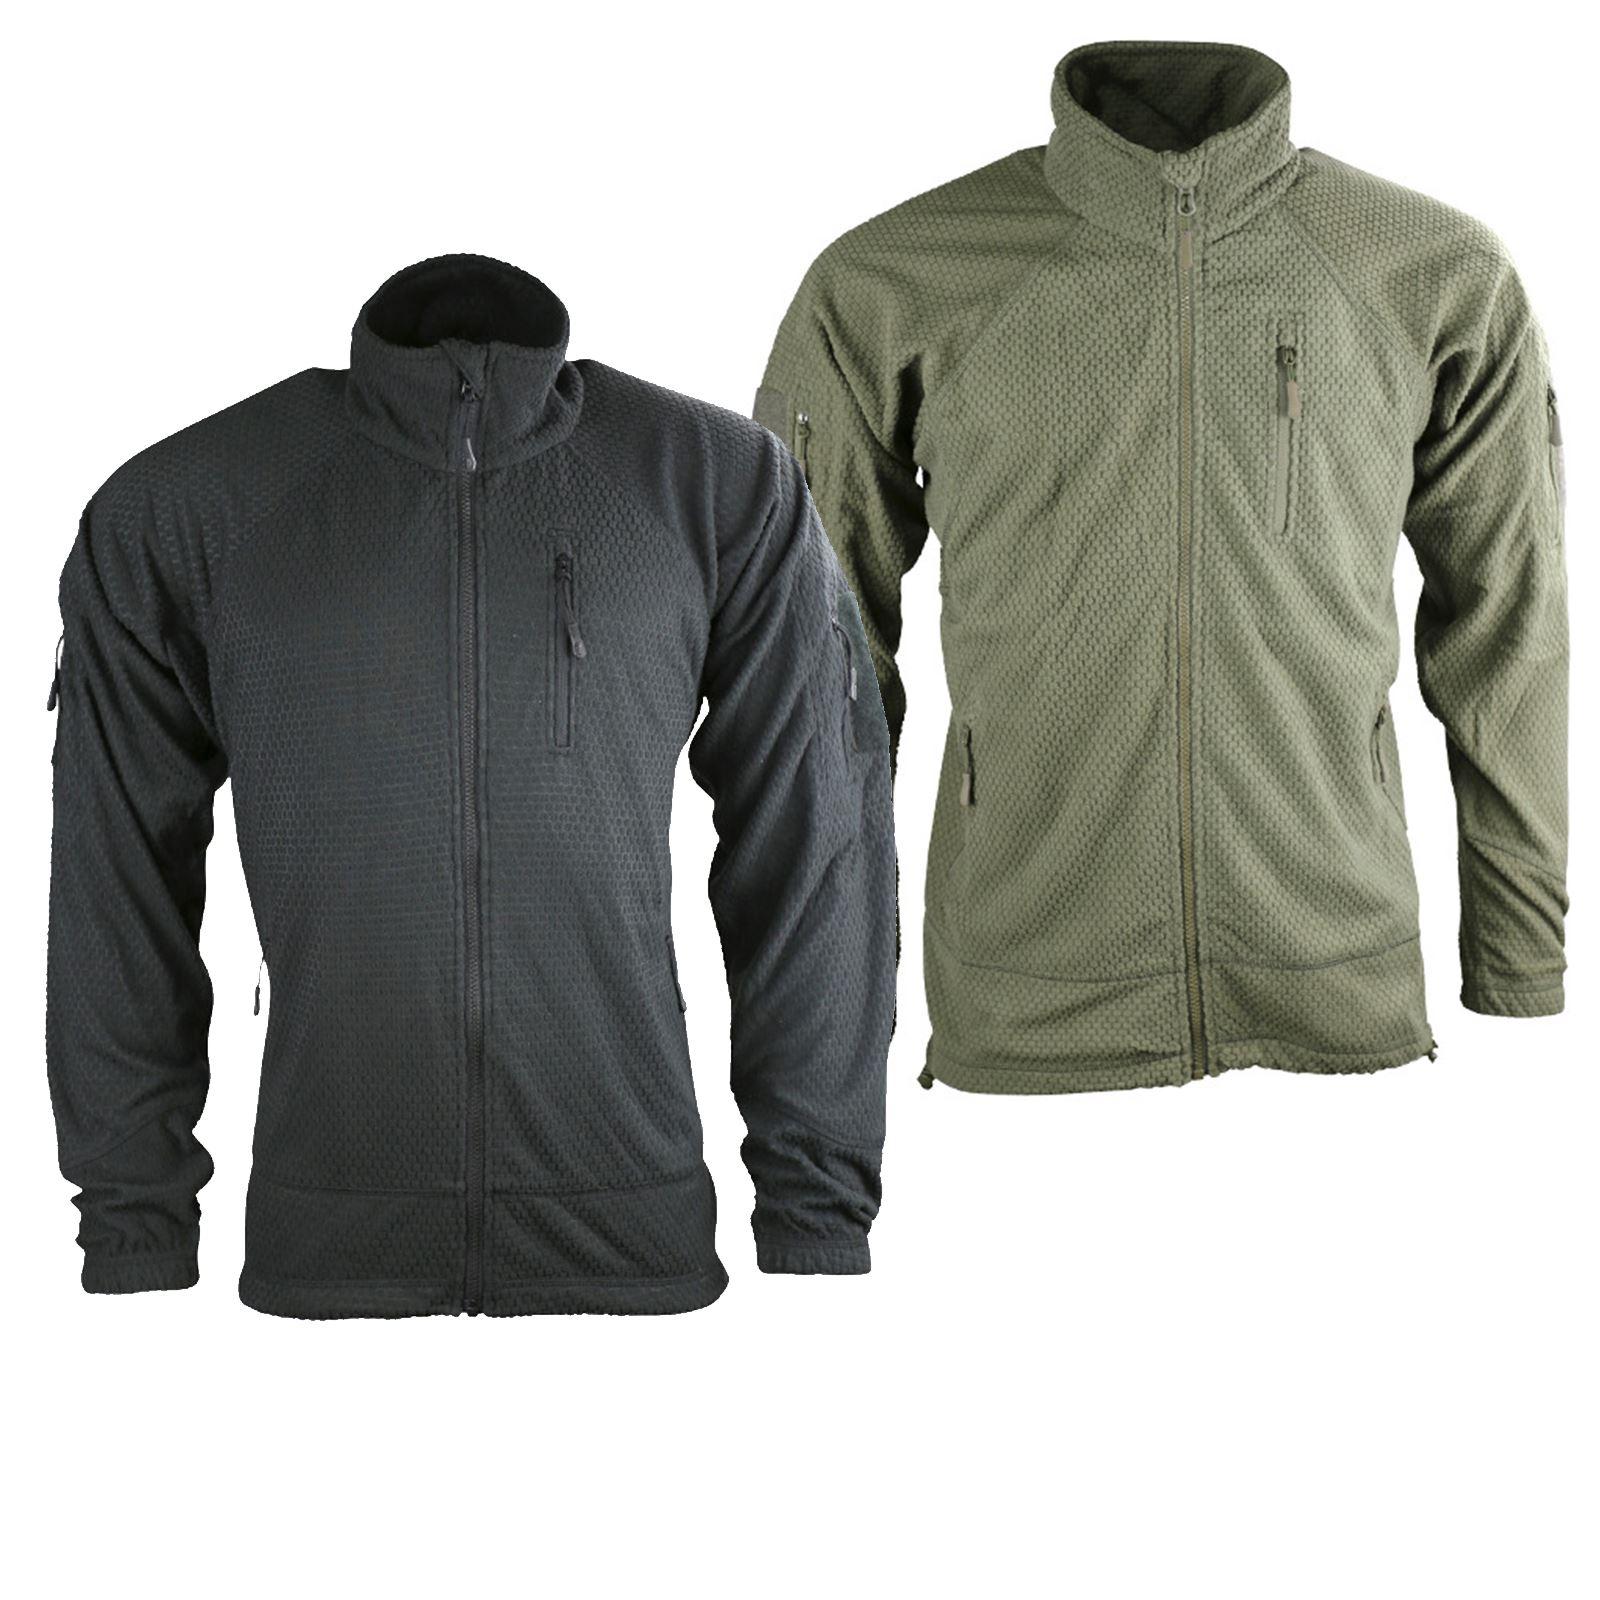 Olive Green Black Military Hunting Kombat UK Gents Delta Tactical Grid Fleece